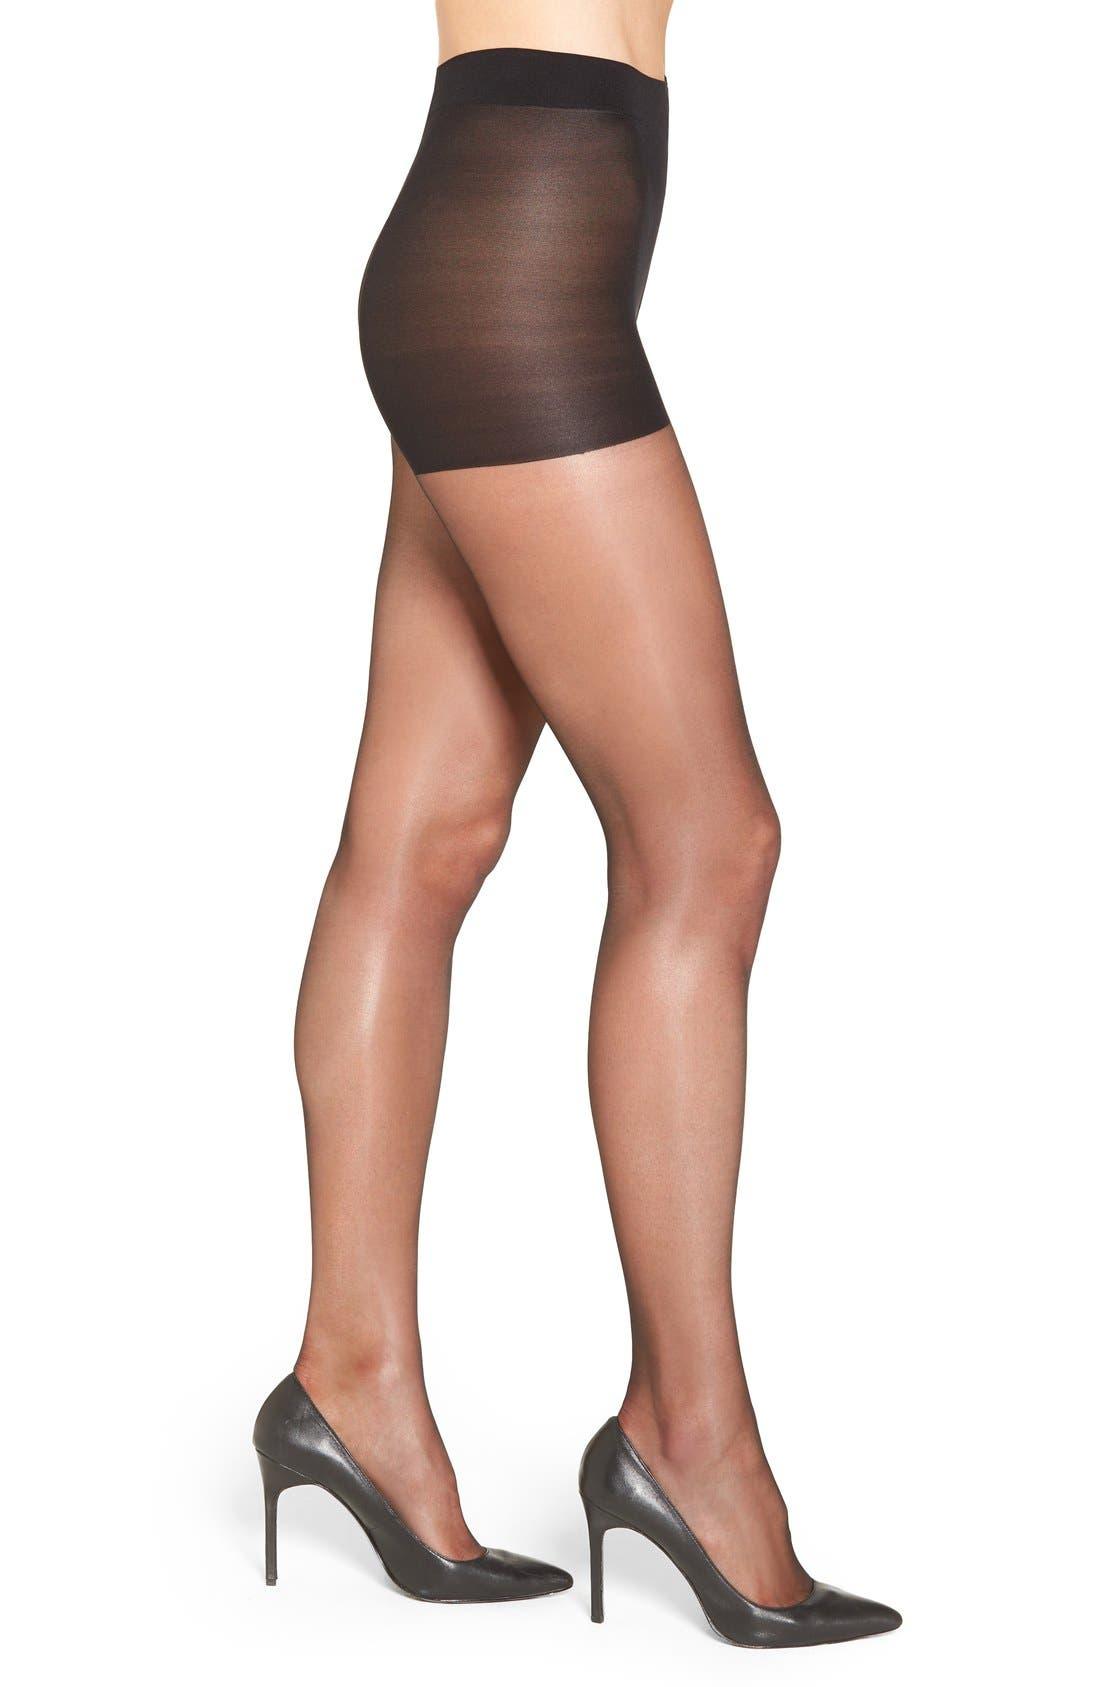 'Gloss' Control Top Pantyhose,                         Main,                         color, Black